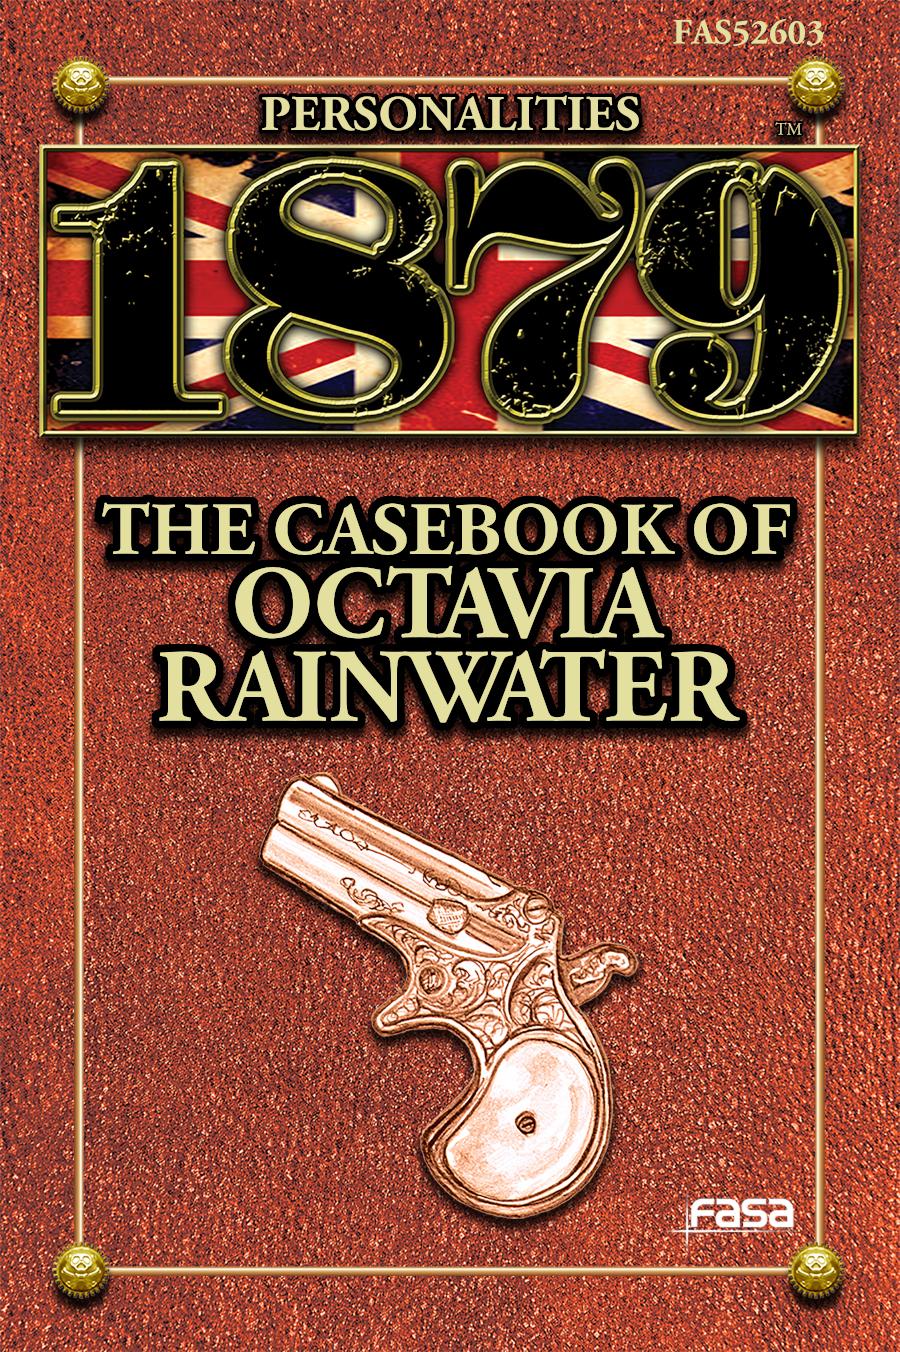 1879 RPG Personalities 03 Octavia Rainwater